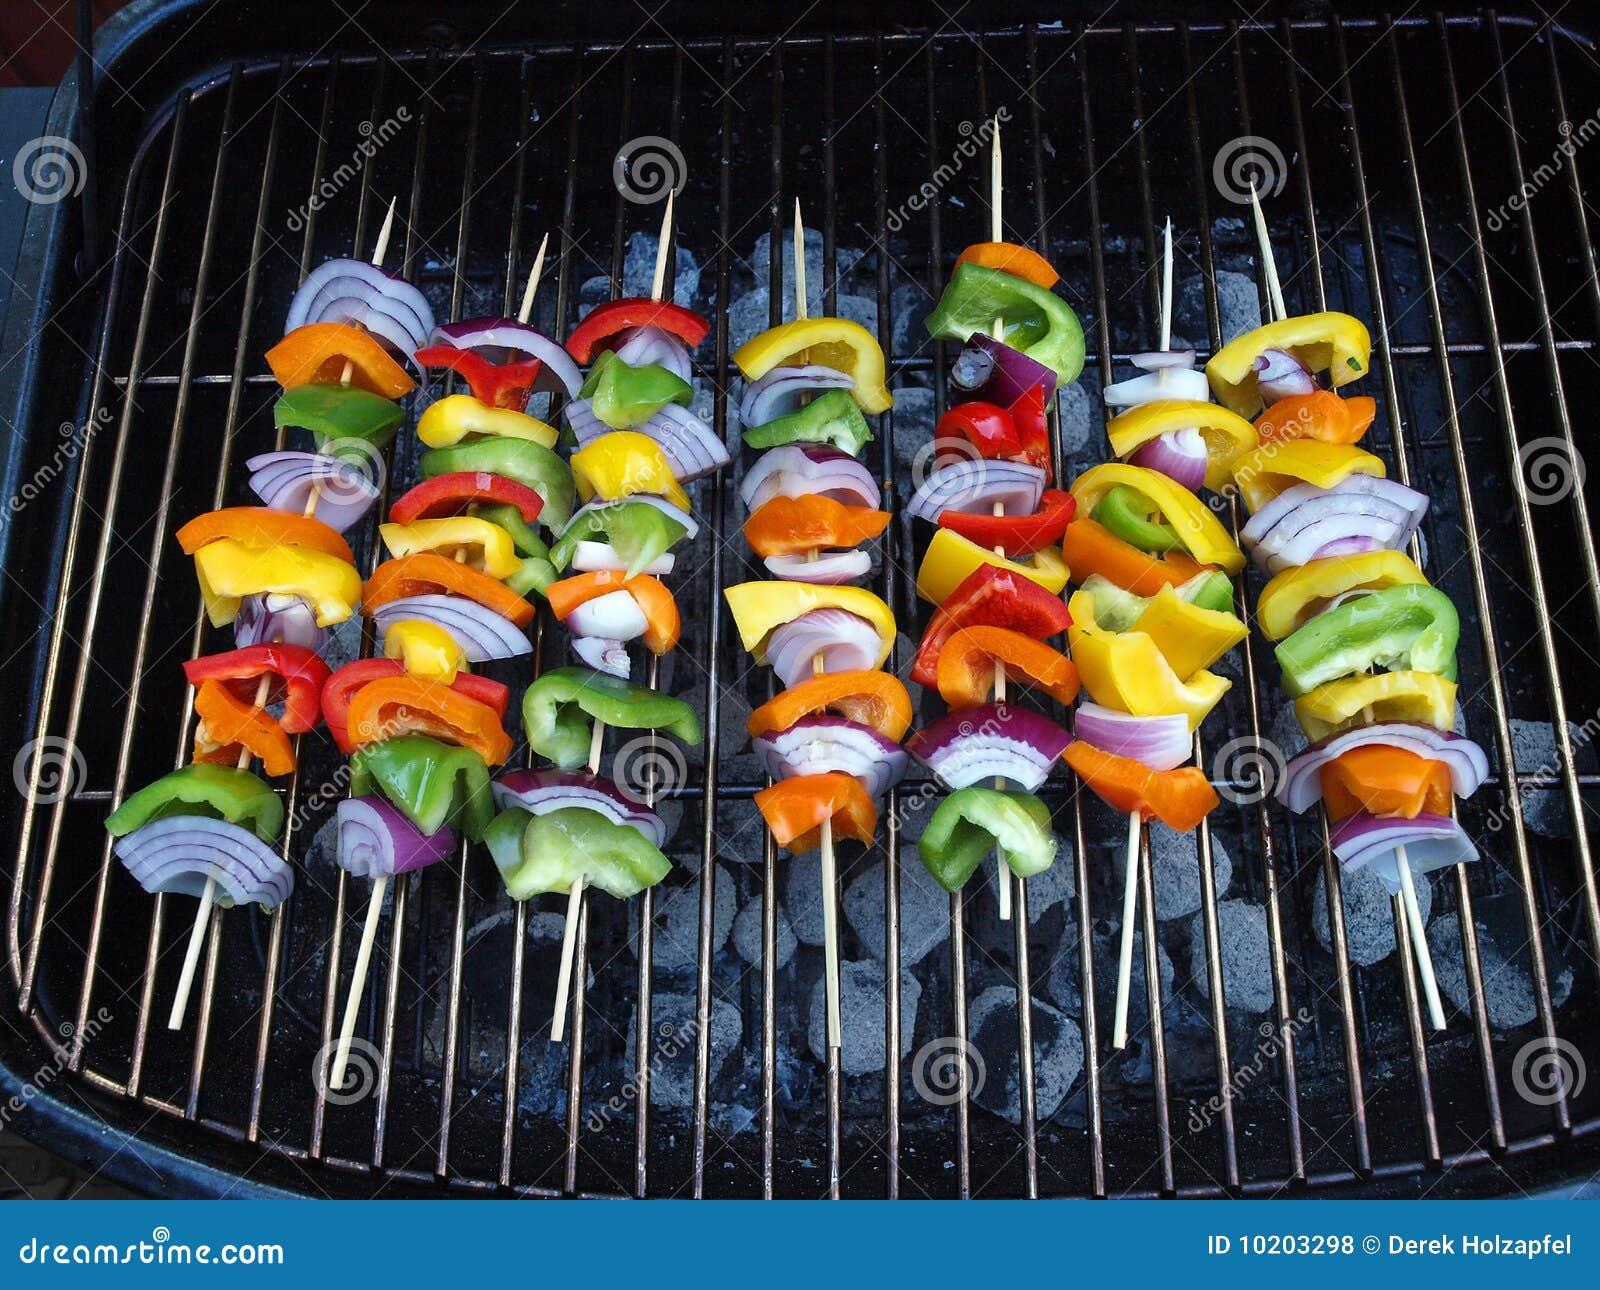 Bbq Vegetable Kabob Royalty Free Stock Photos Image Watermelon Wallpaper Rainbow Find Free HD for Desktop [freshlhys.tk]